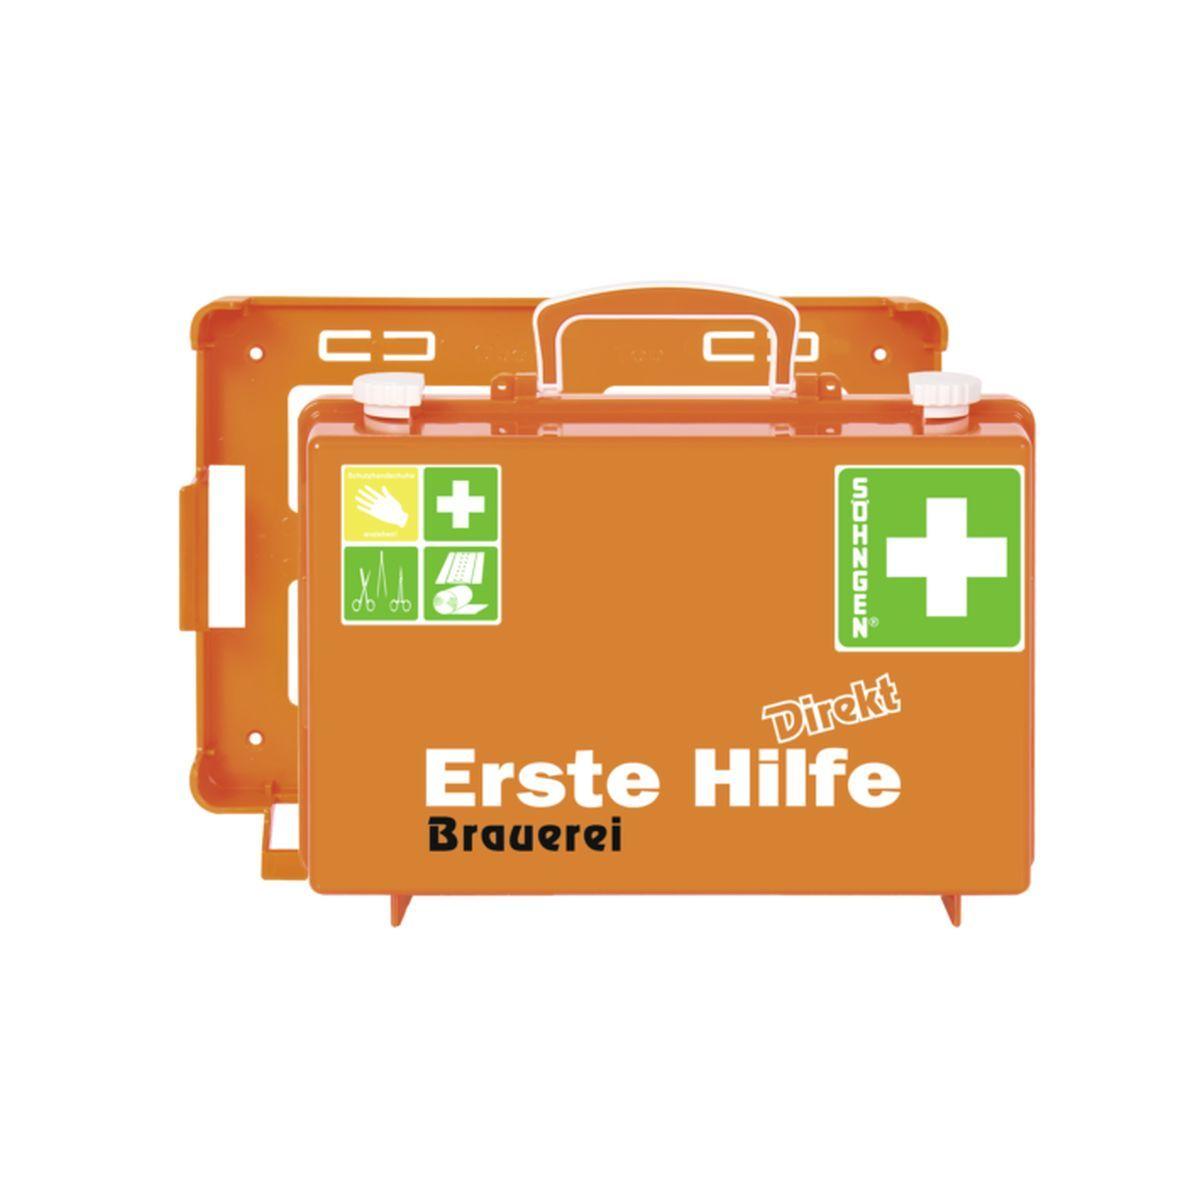 Erste Hilfe Koffer DIN 13157 DIREKT, Brauerei